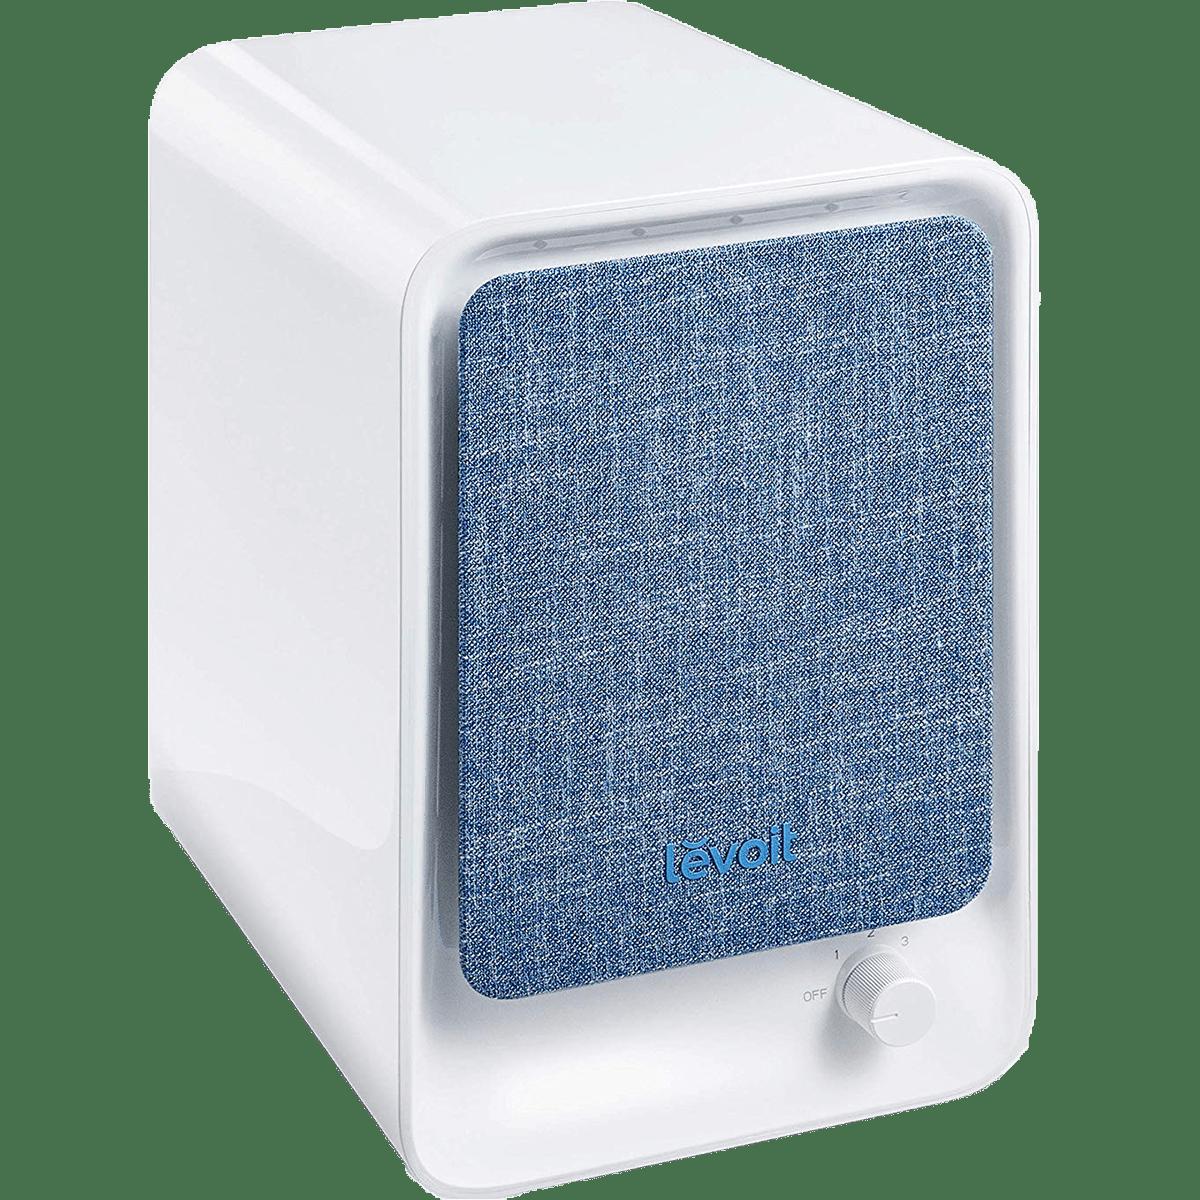 levoit lv h126 personal hepa air purifier sylvane. Black Bedroom Furniture Sets. Home Design Ideas